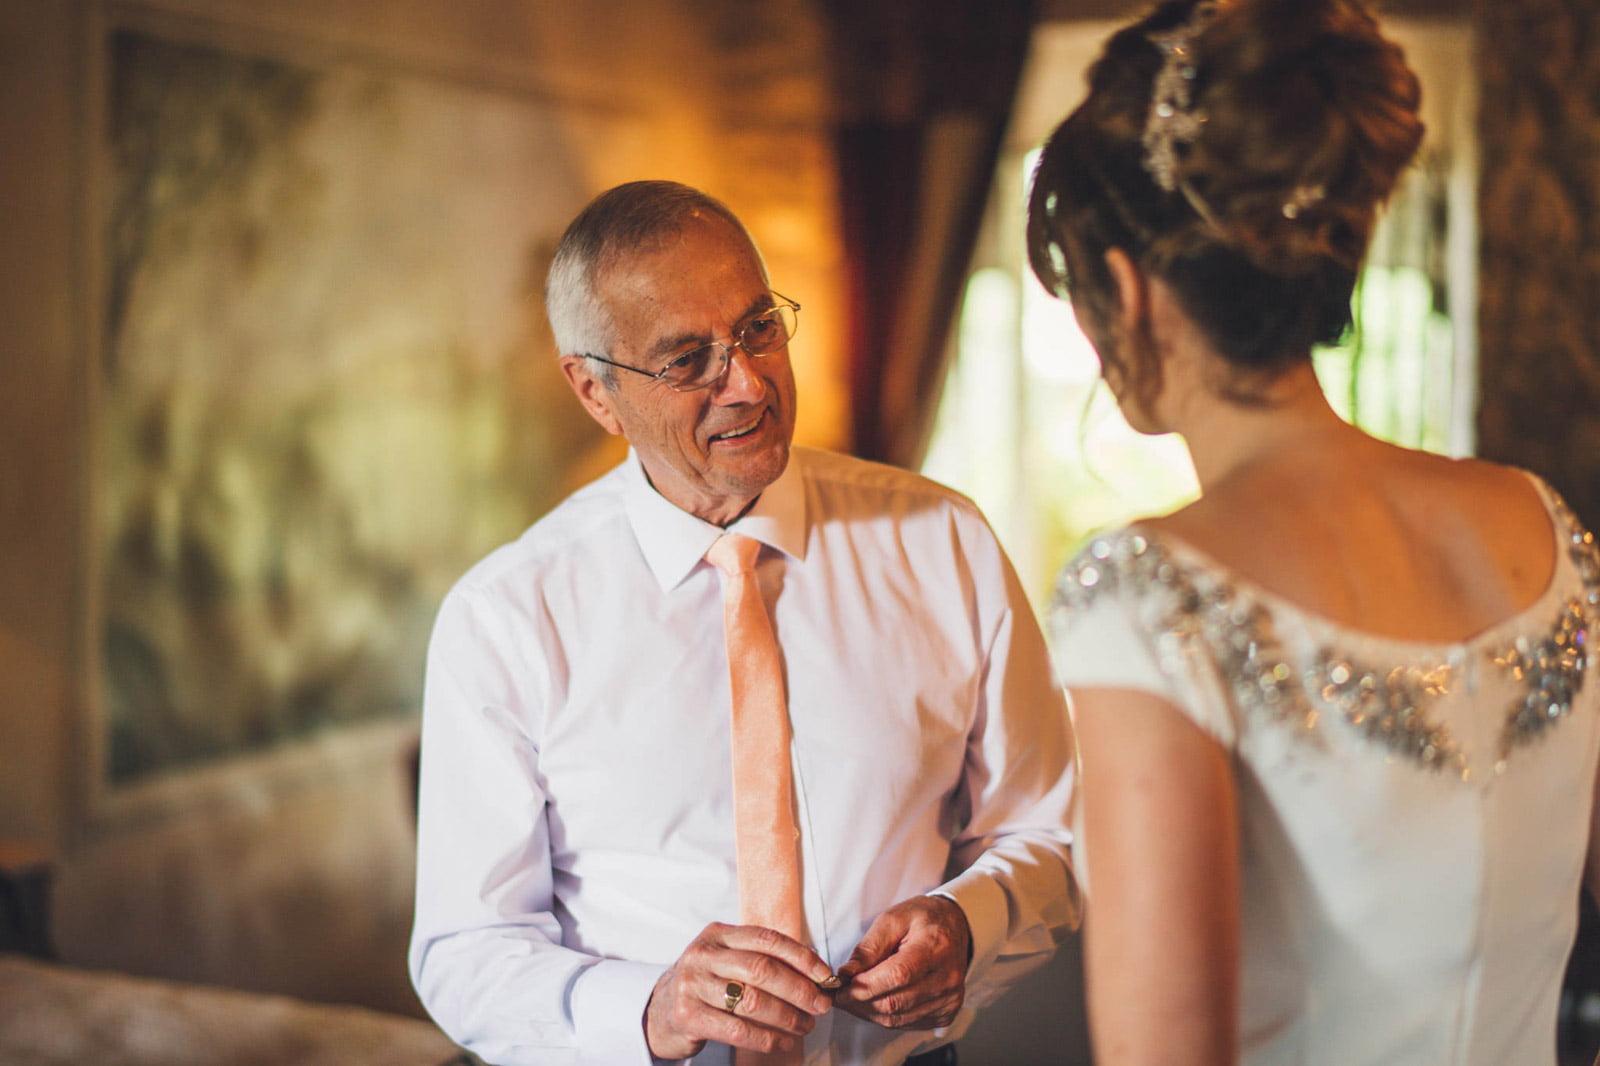 031-wedding-tuscany-san-galgano-federico-pannacci-photographer